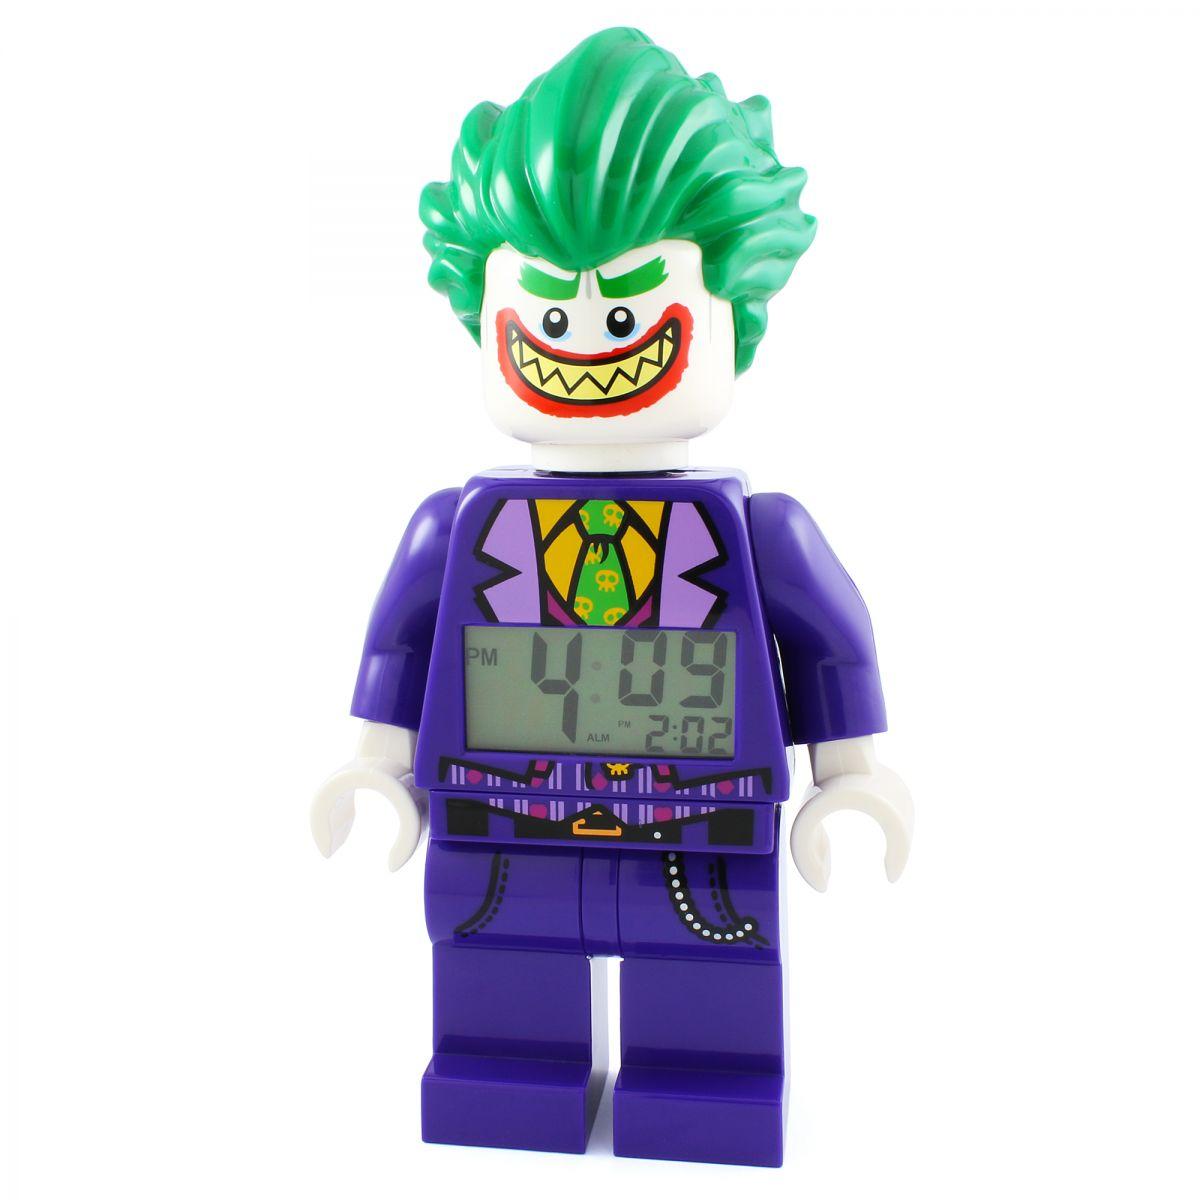 Childrens LEGO Batman Movie The Joker minifigure clock Alarm Watch (9009341)   WatchShop.com™  sc 1 st  Watch Shop & Childrens LEGO Batman Movie The Joker minifigure clock Alarm Watch ...